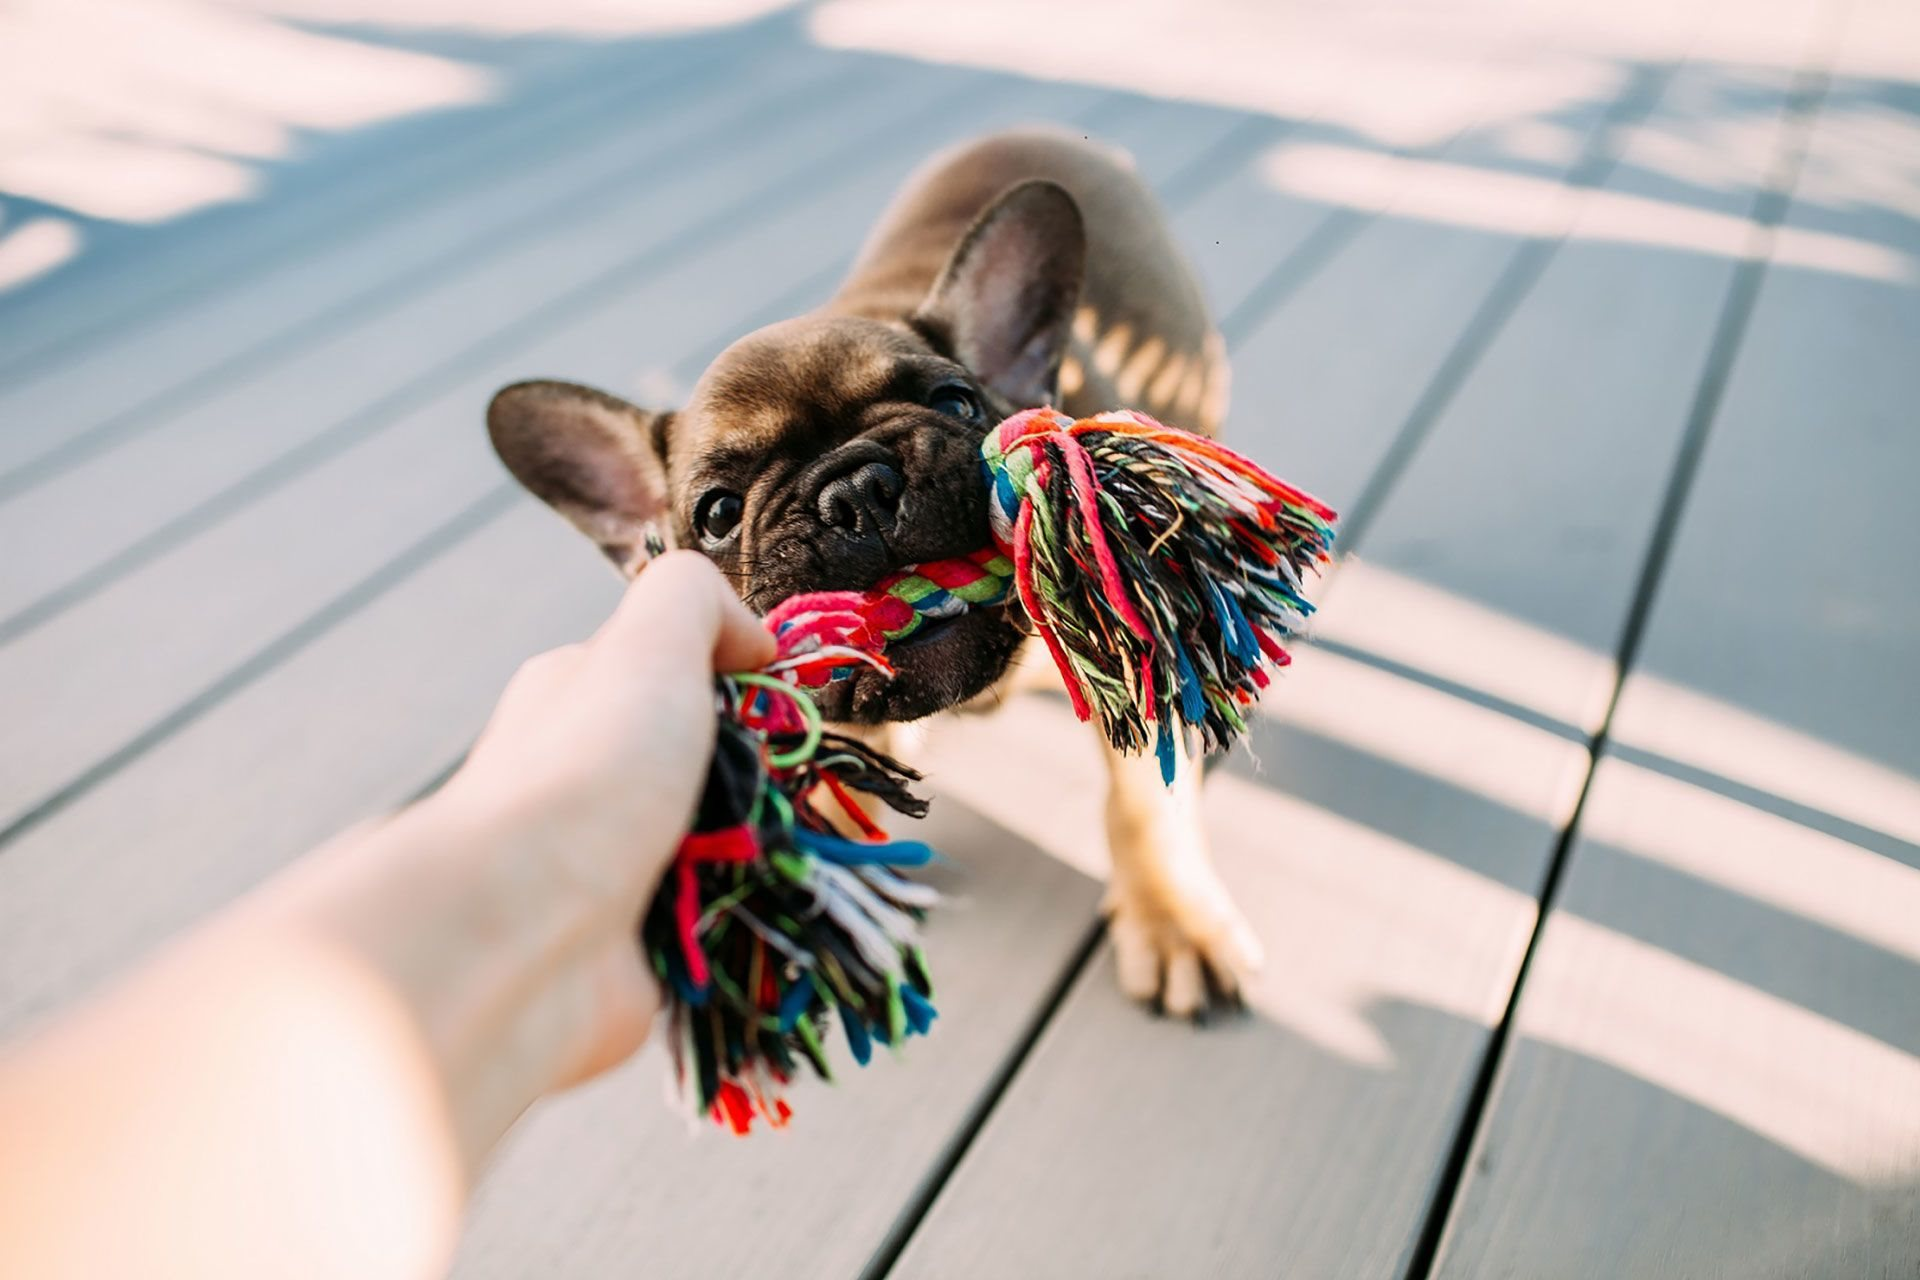 Pet-Friendly Apartment Community with Pet Park at Windsor Burnet, Texas, 78758